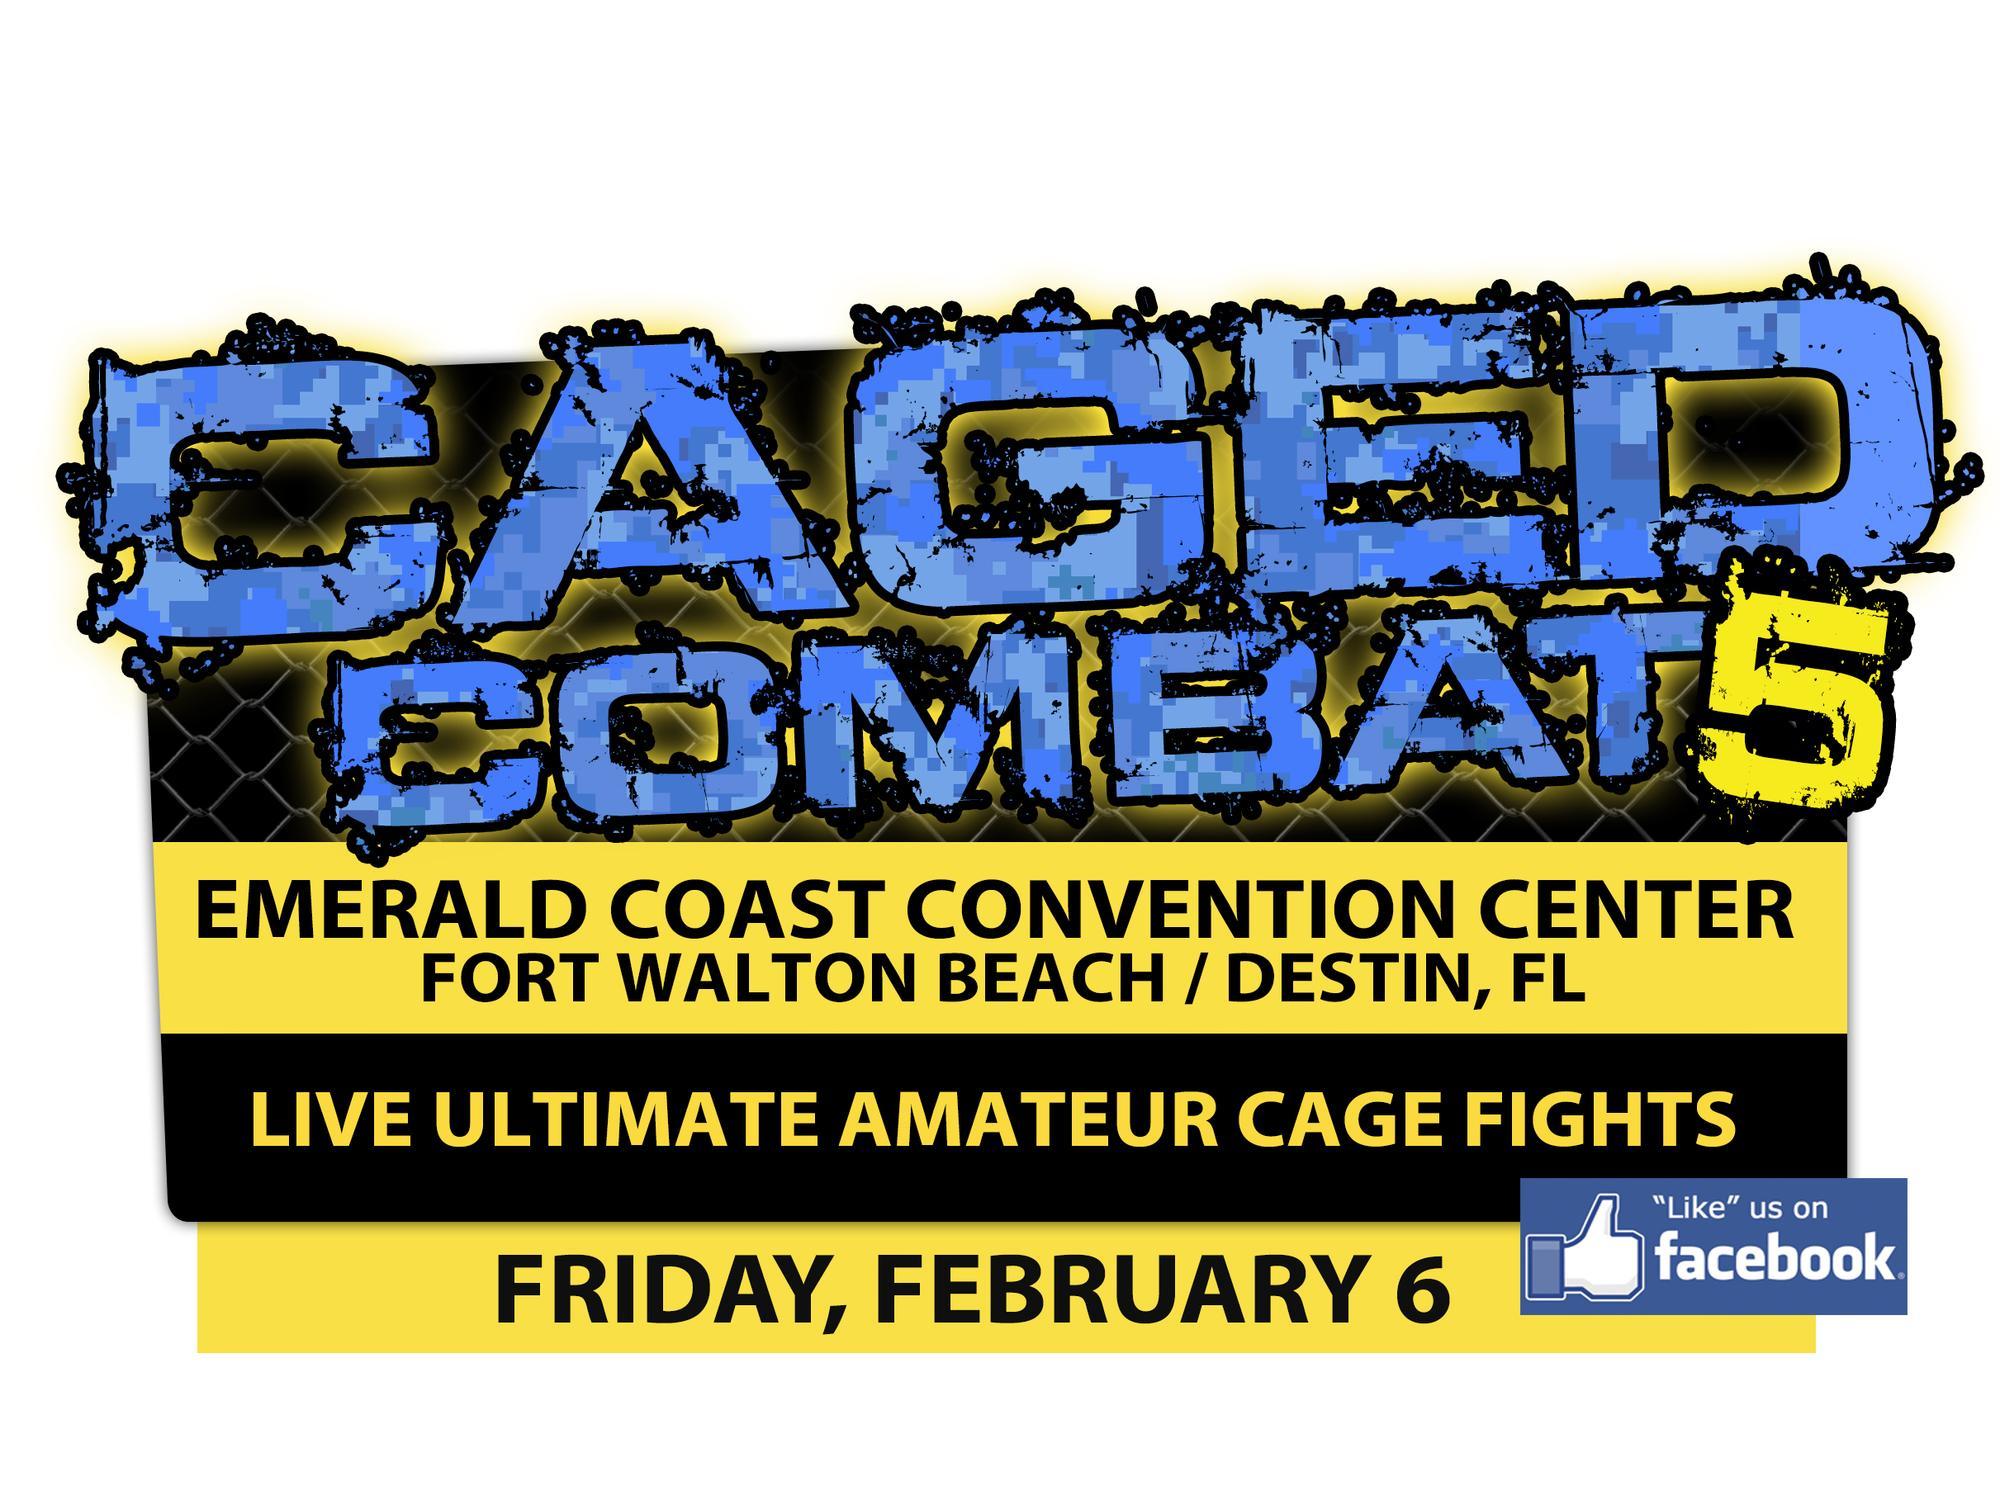 Fort Walton Beach Convention Center